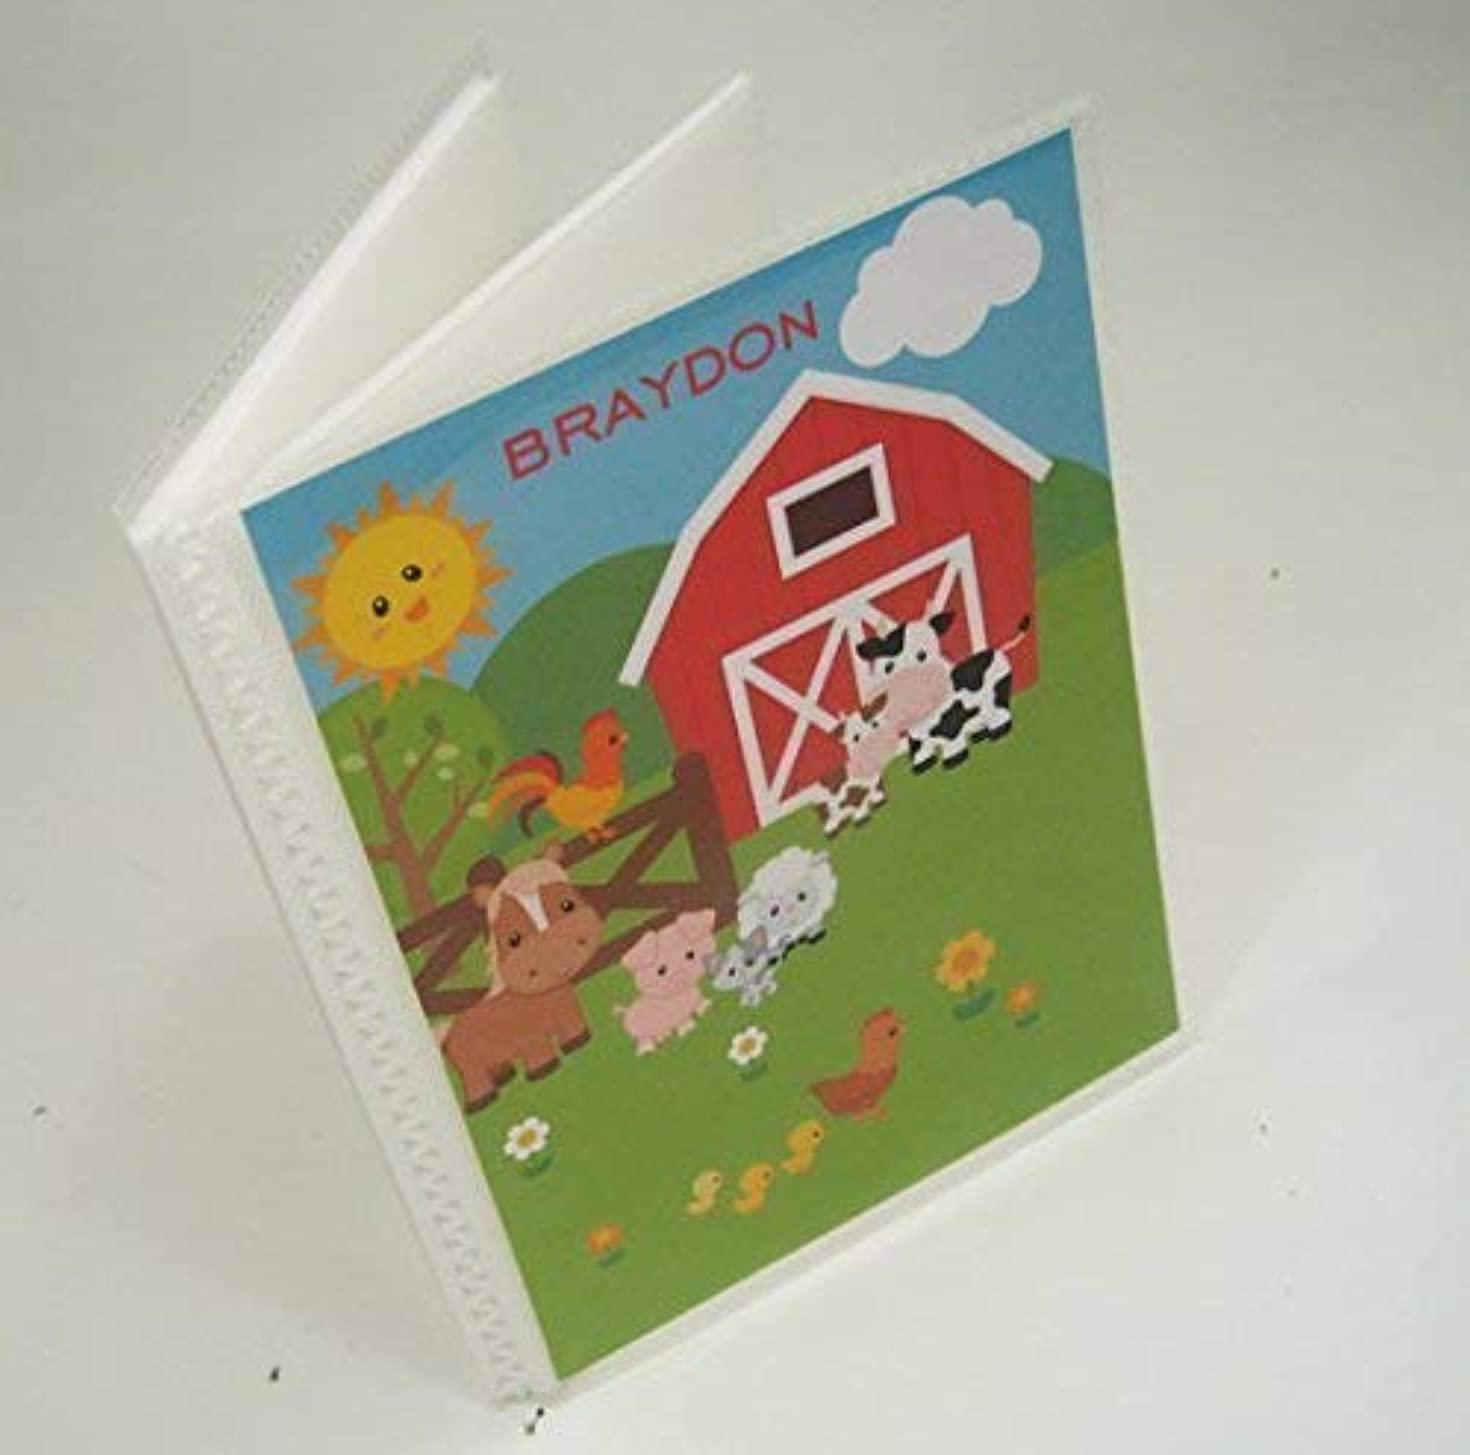 Baby Photo Album IA#095 Farm Barnyard Animals Personalized Grandmas Brag Book 4x6 or 5x7 Picture Boy or Girl